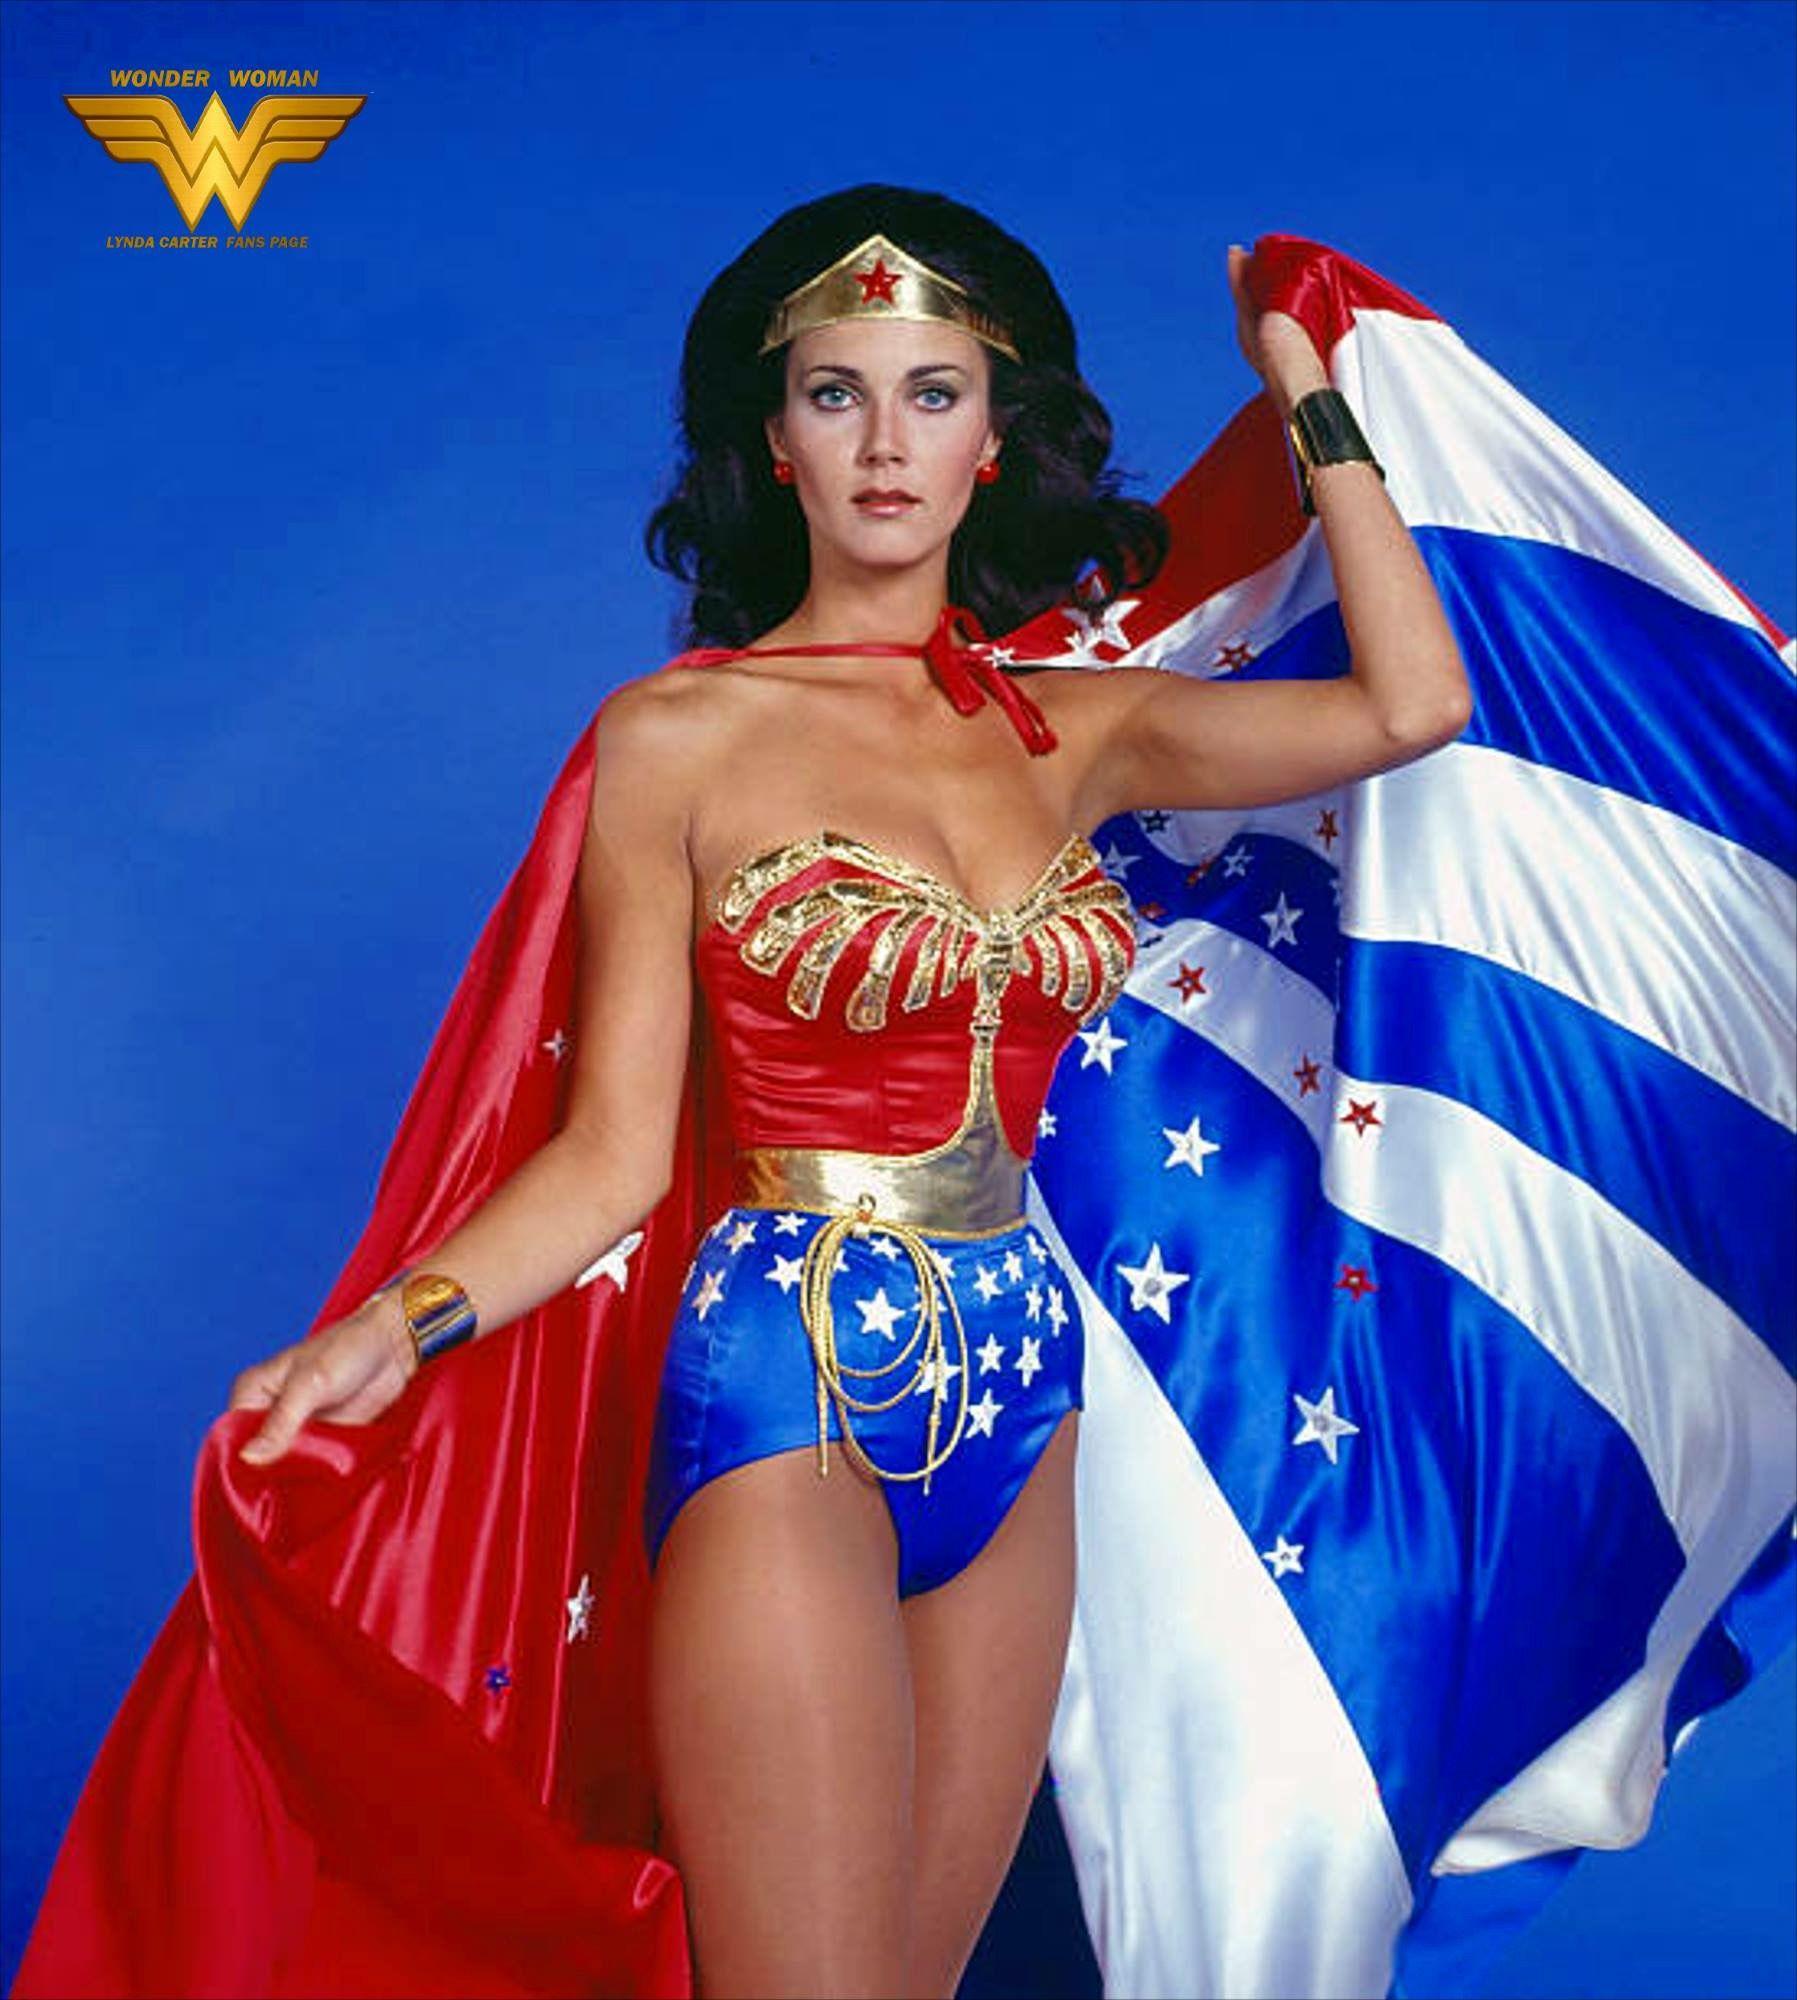 Wonder Woman Birthday With Images Wonder Woman Birthday